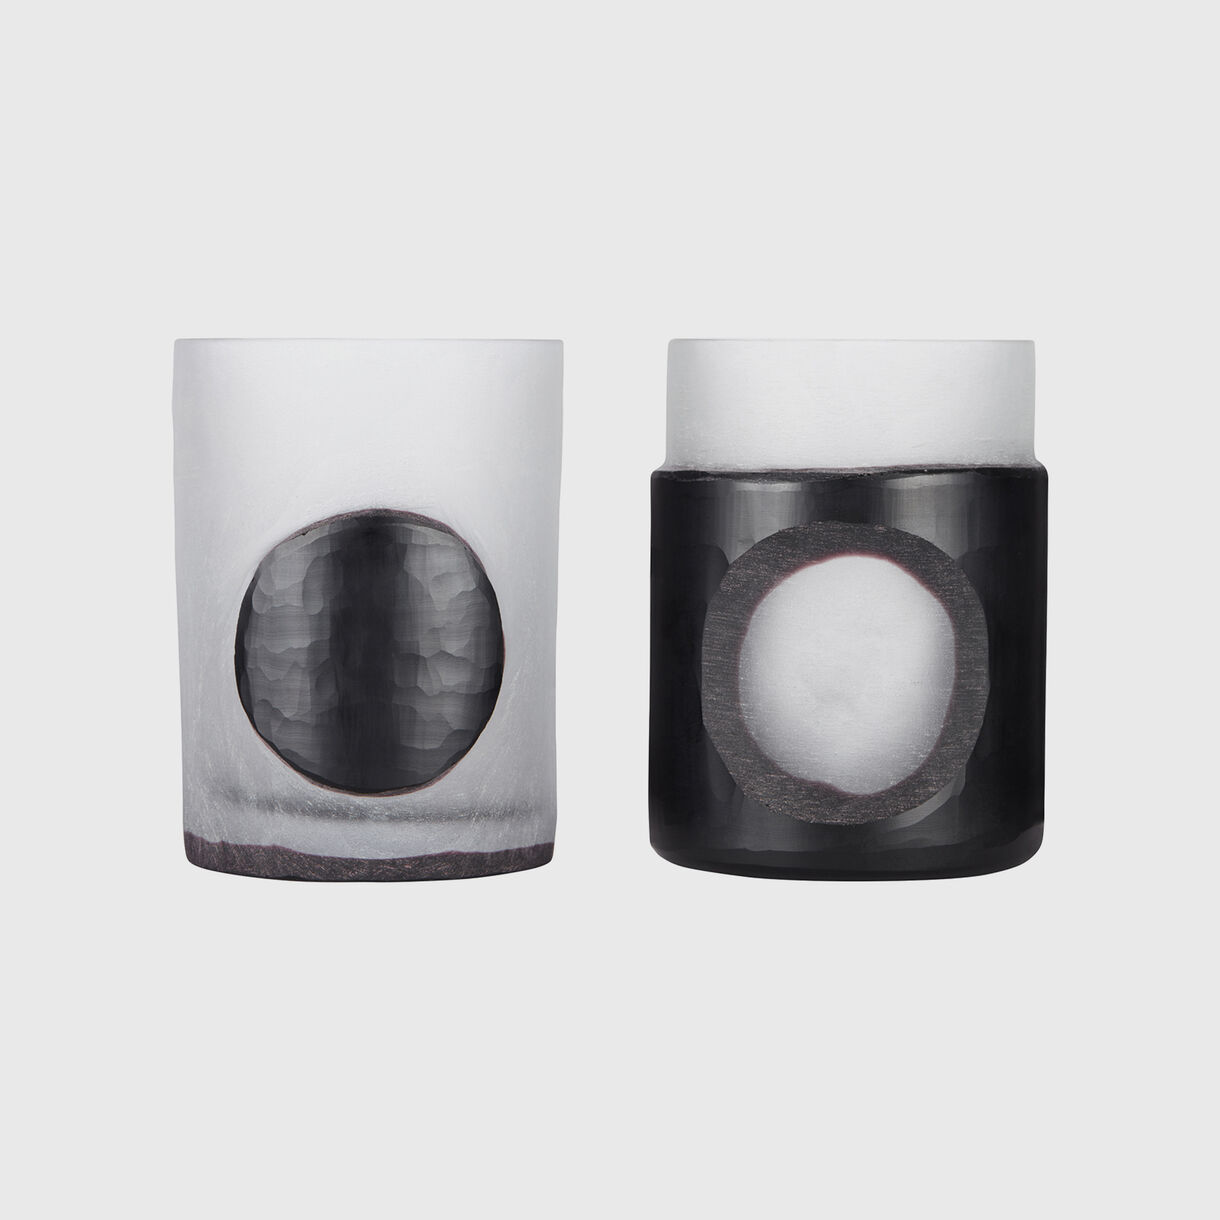 Carved Stem Vases, Black